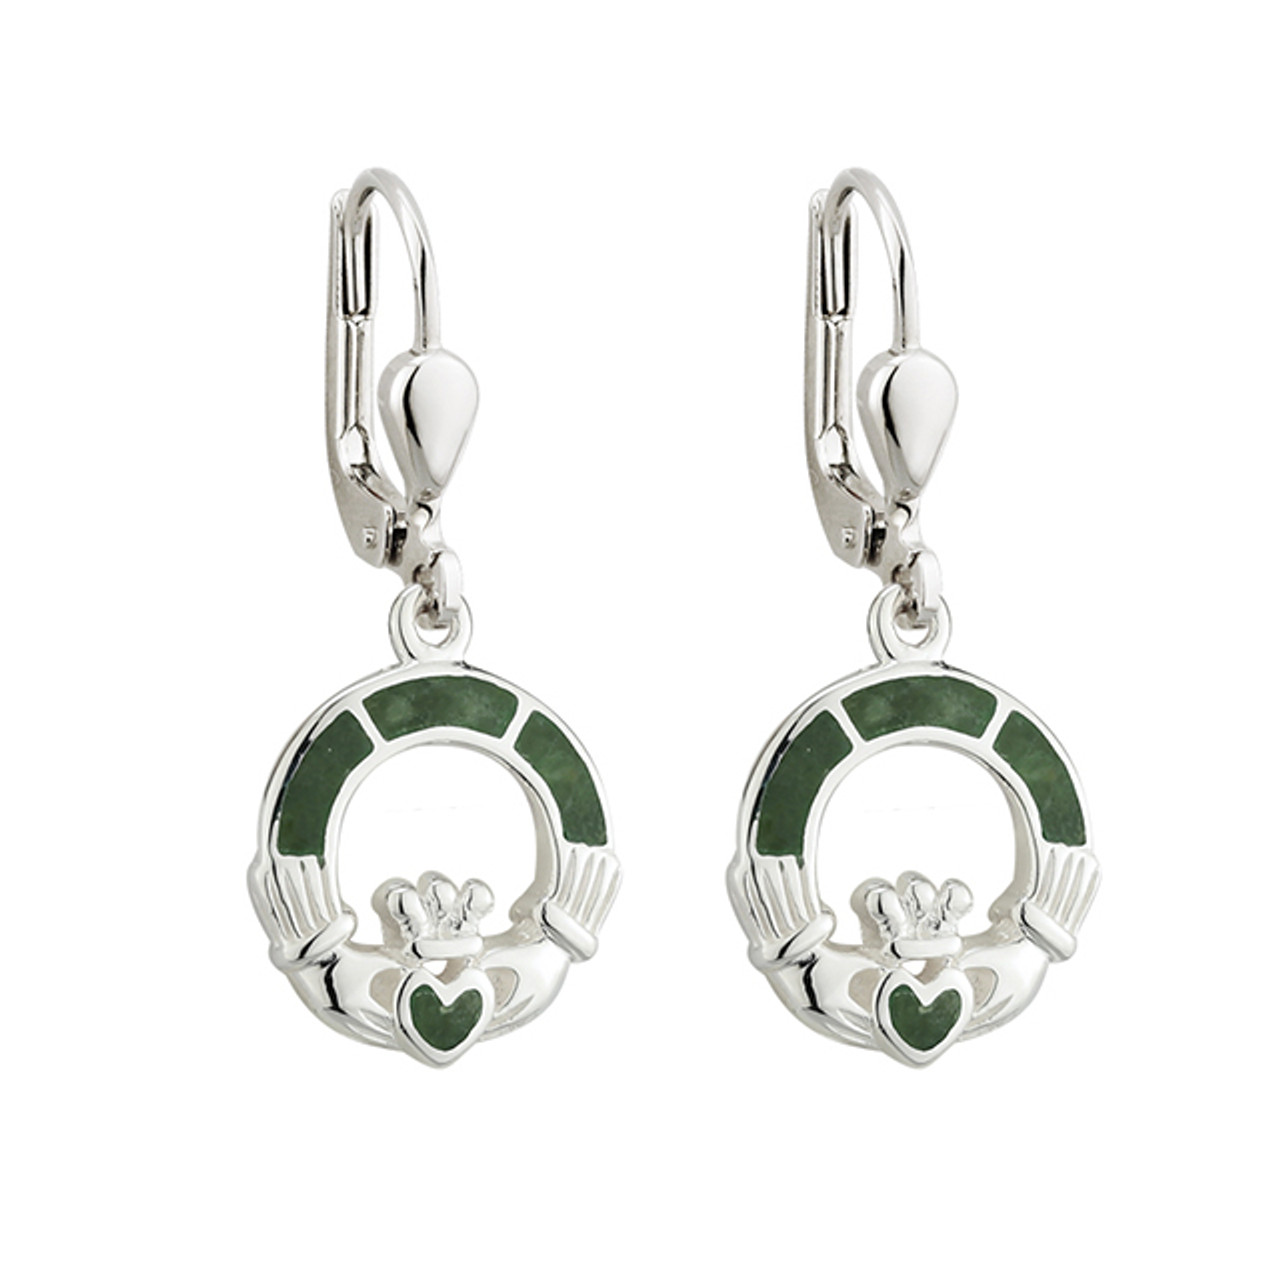 Claddagh Earrings with Connemara Marble